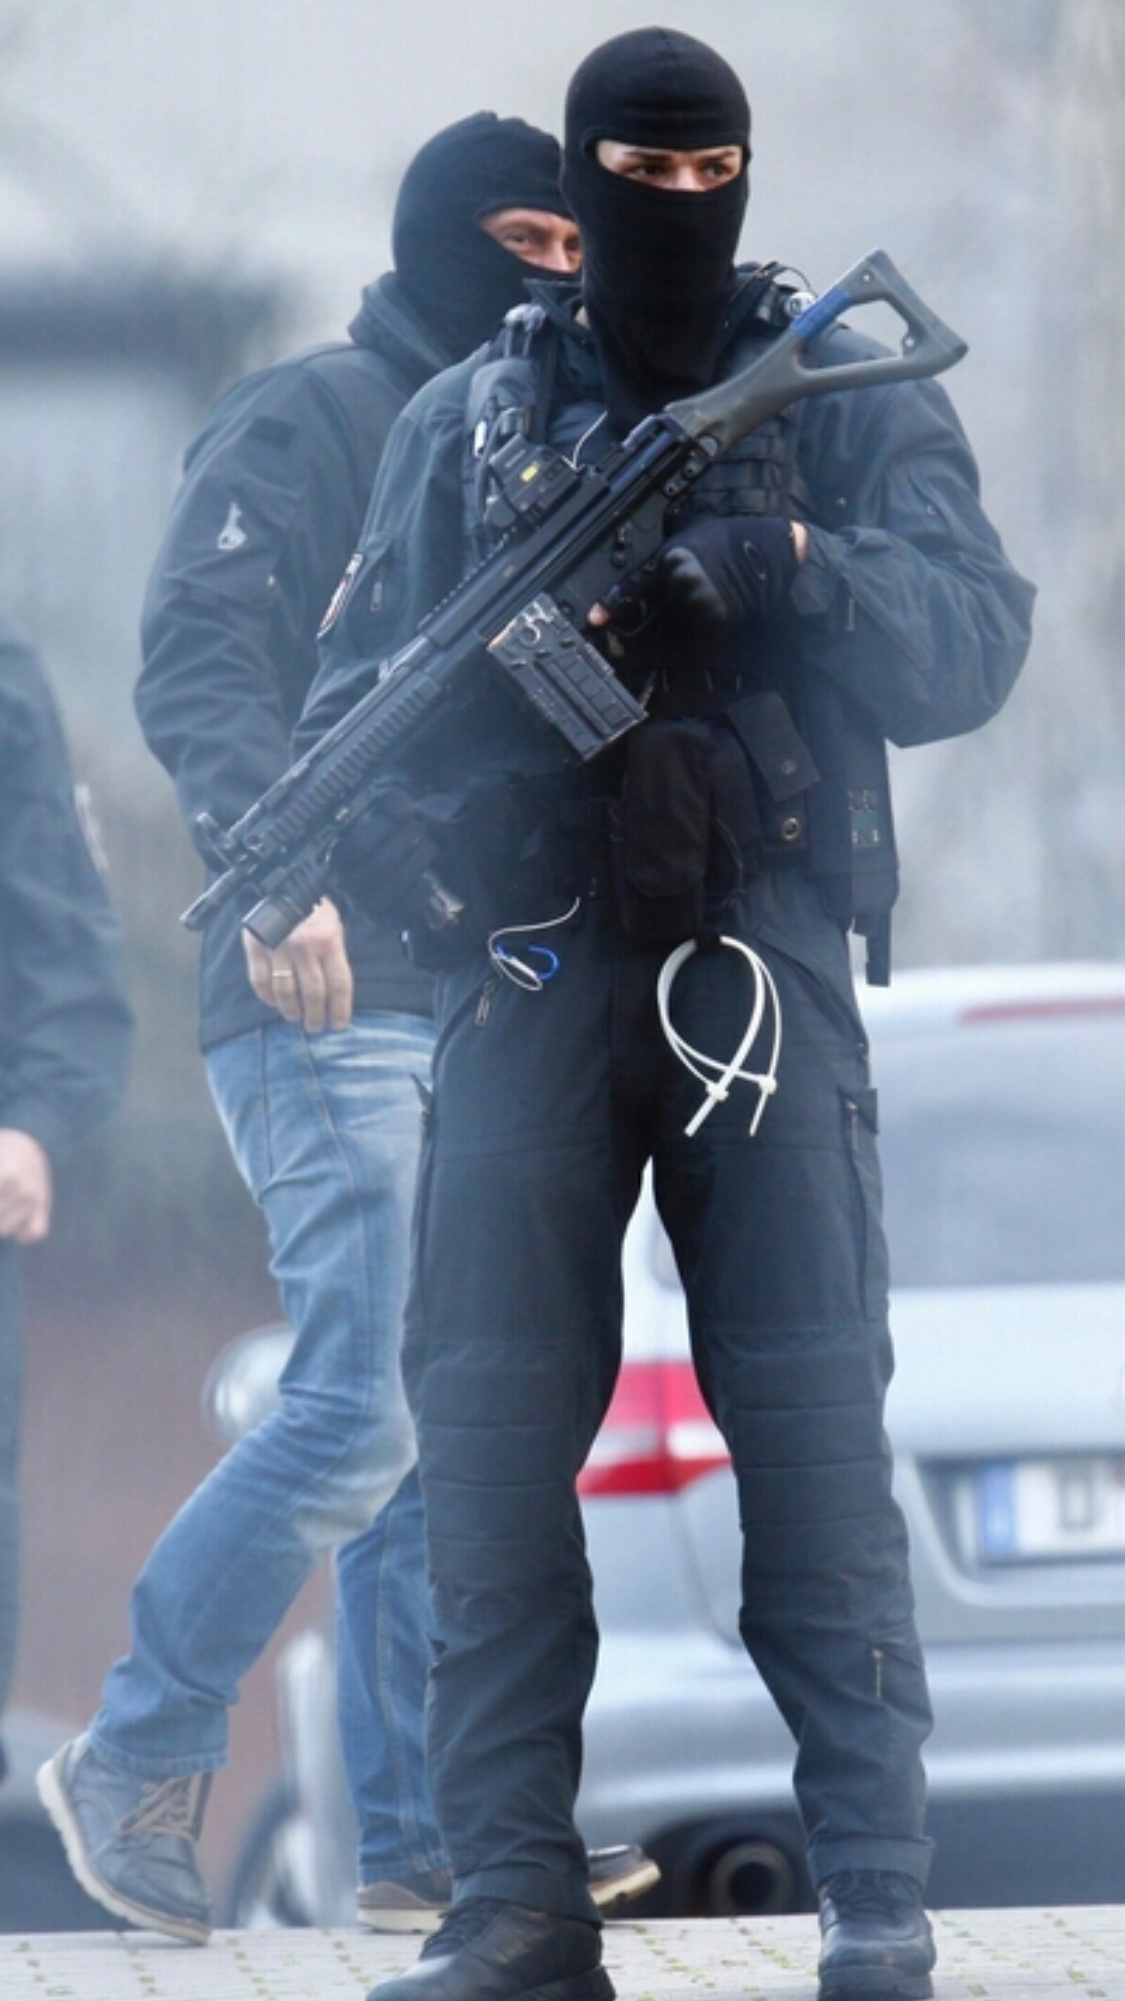 German Police G3 stock-img_1267.jpg